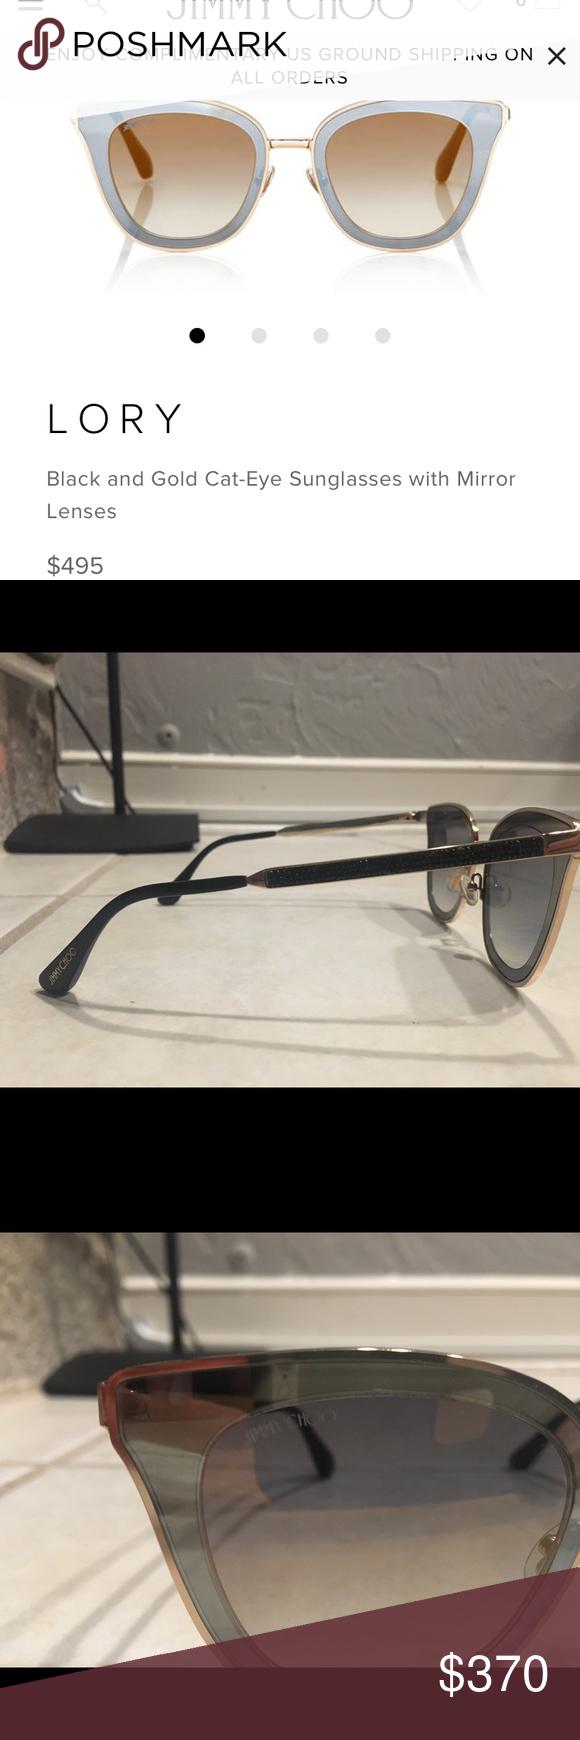 cd92caaed95 Jimmy Choo Lory S sunglasses lightly worn sunglasses Jimmy Choo Accessories  Sunglasses